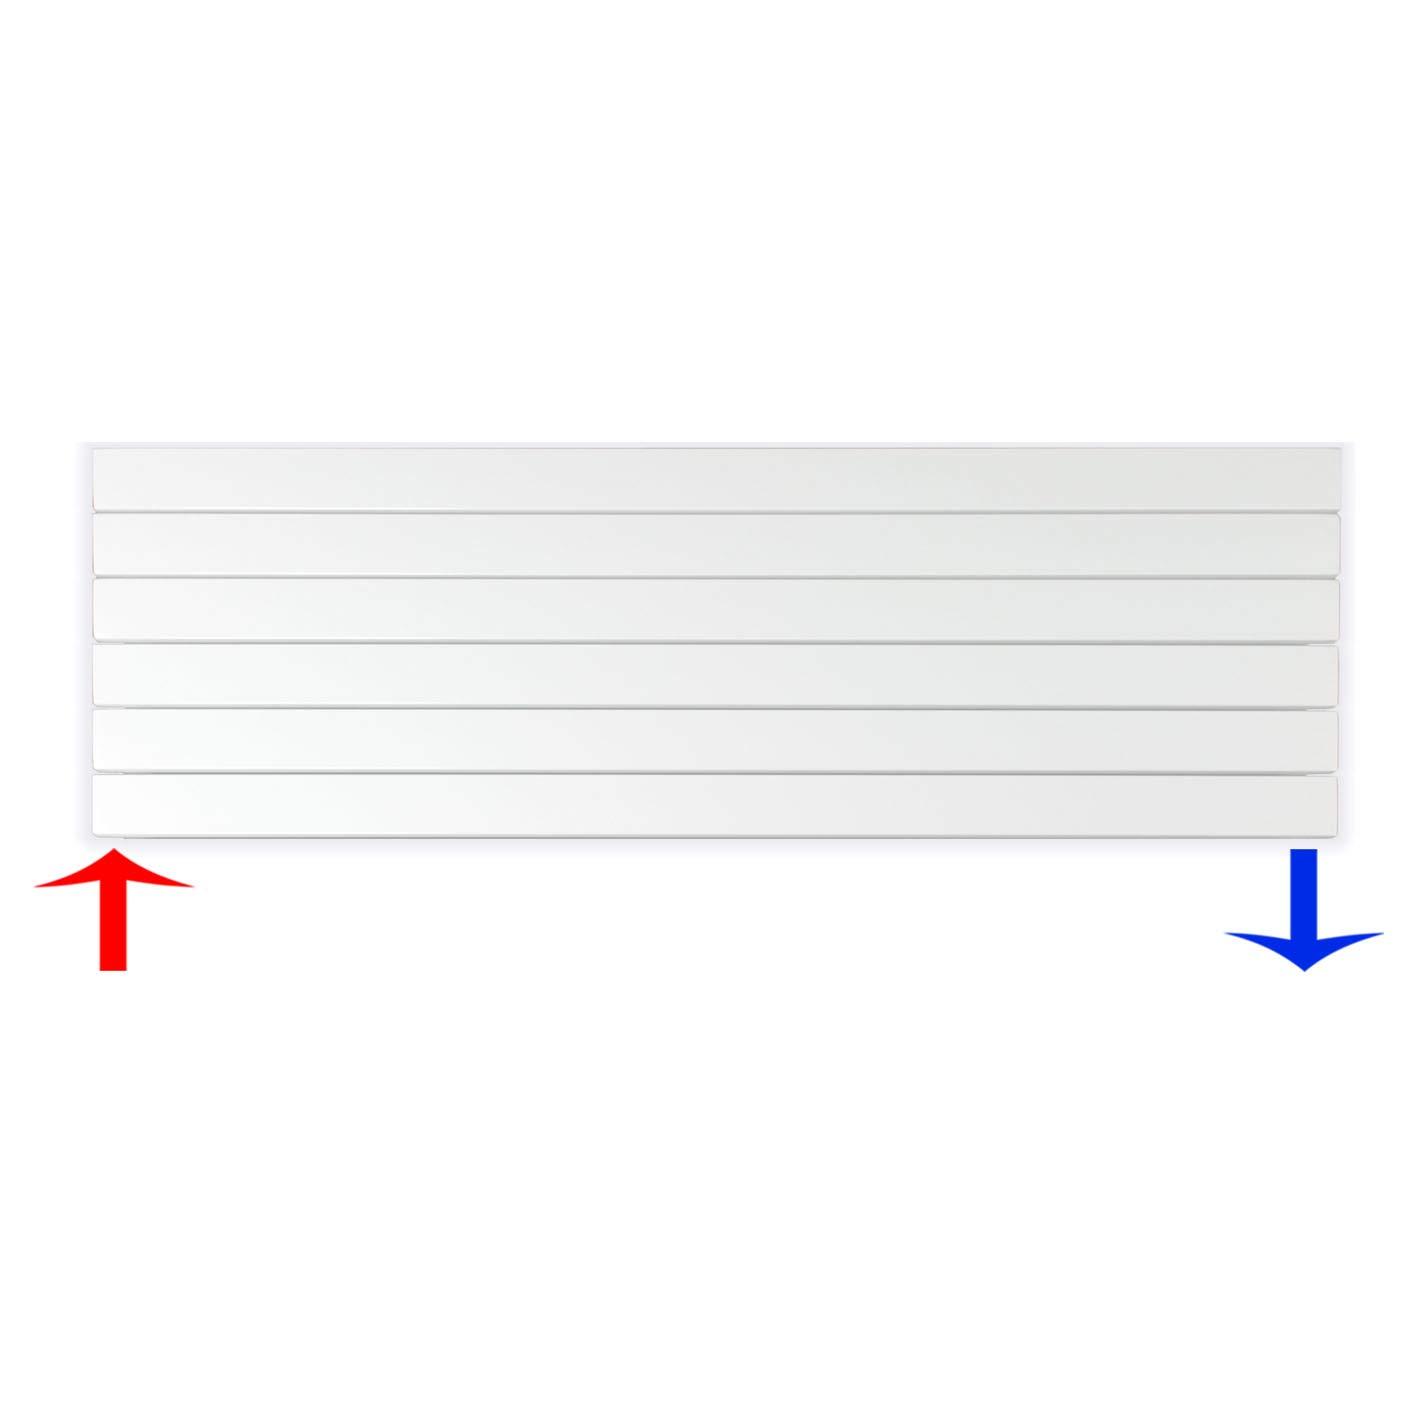 Design Paneelheizk/örper Heizk/örper Badheizk/örper 60 x 60